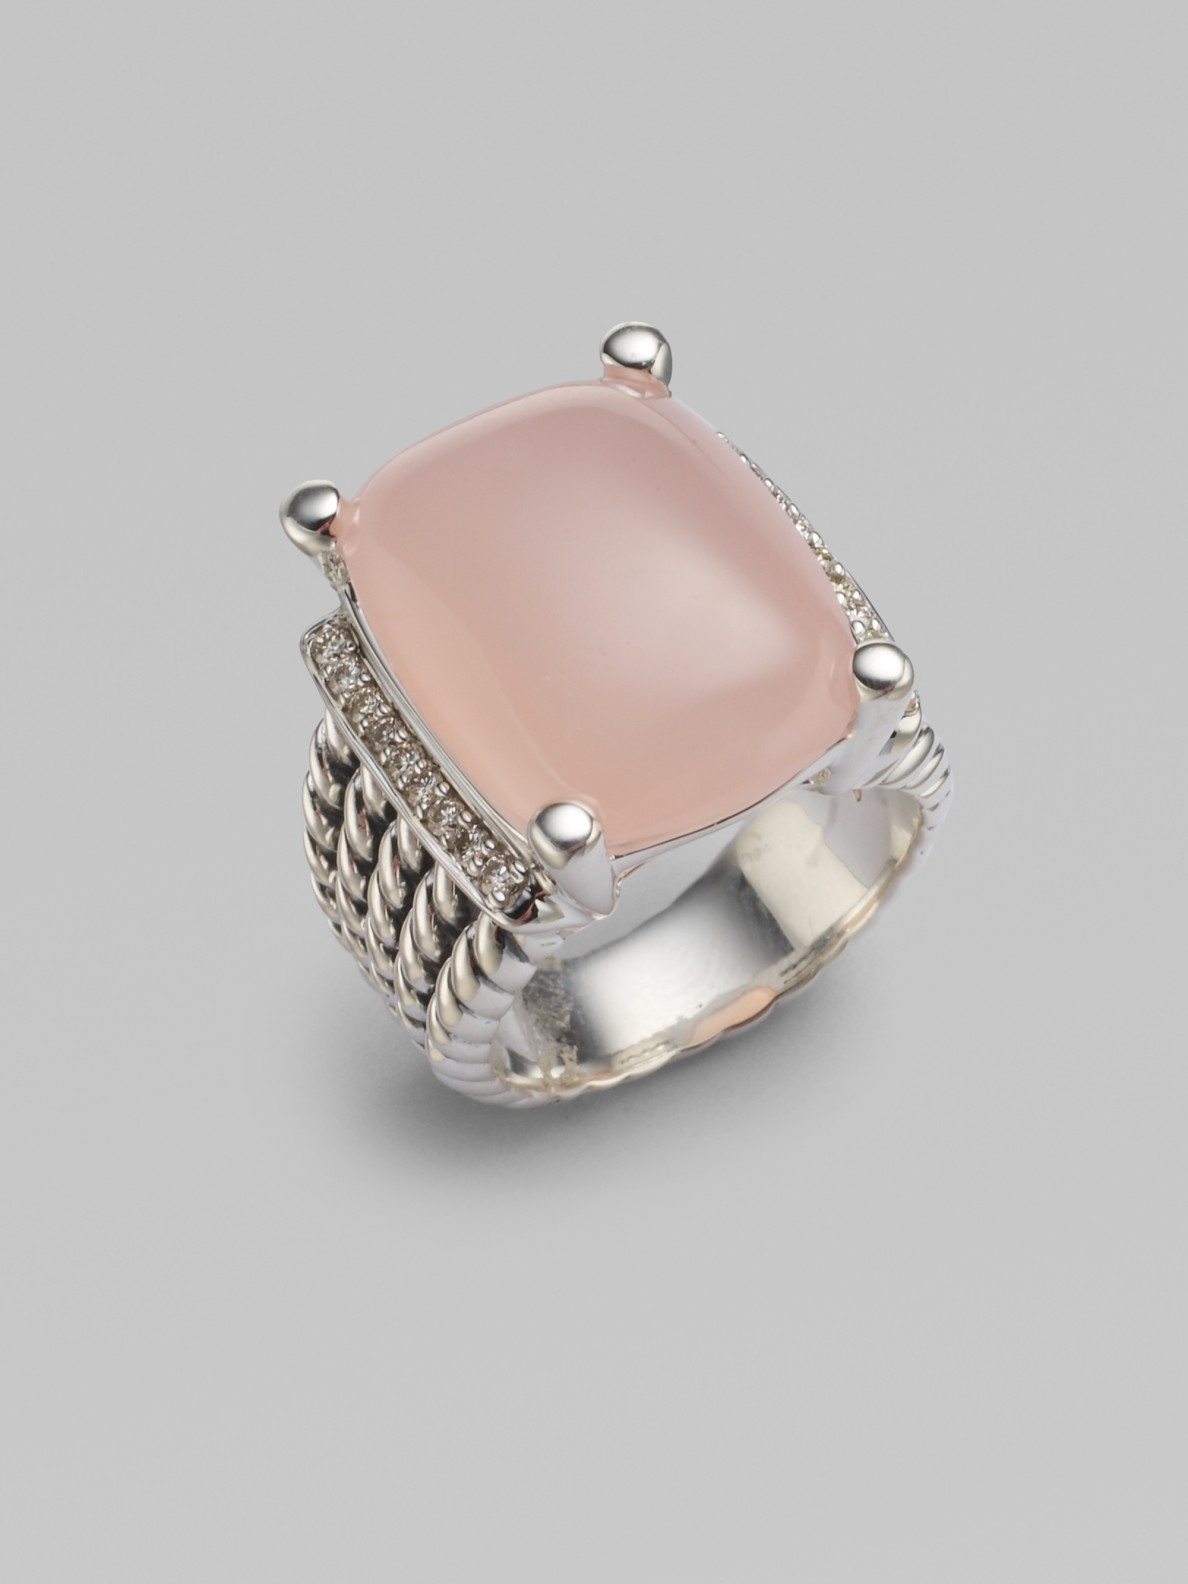 david yurman pink opal sterling silver ring in